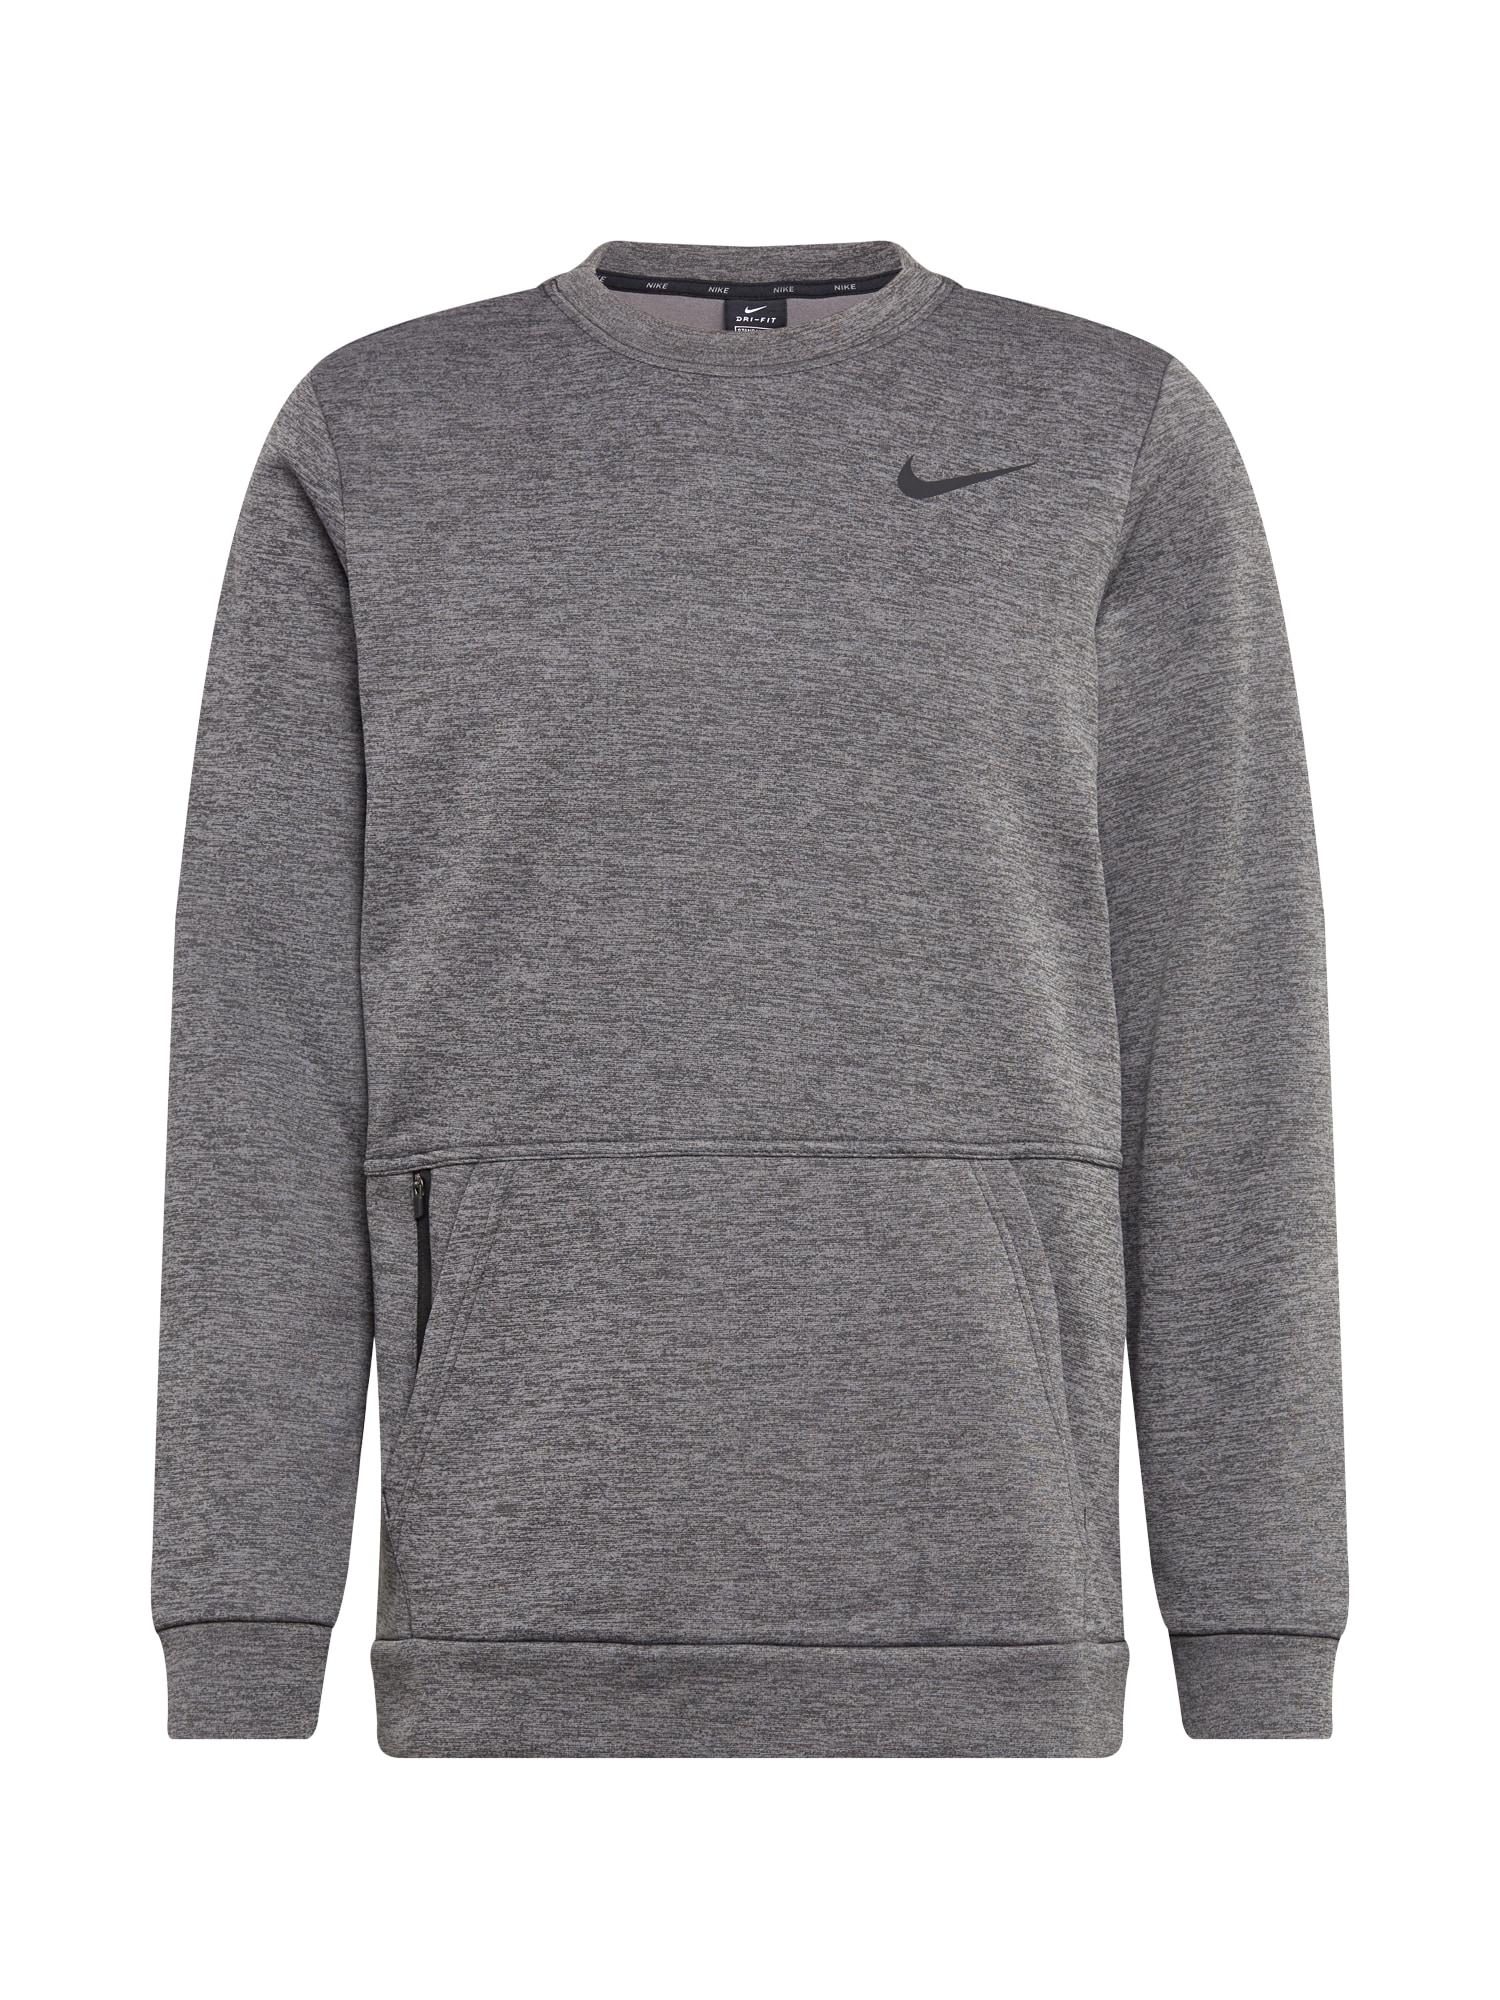 NIKE Sportinio tipo megztinis tamsiai pilka